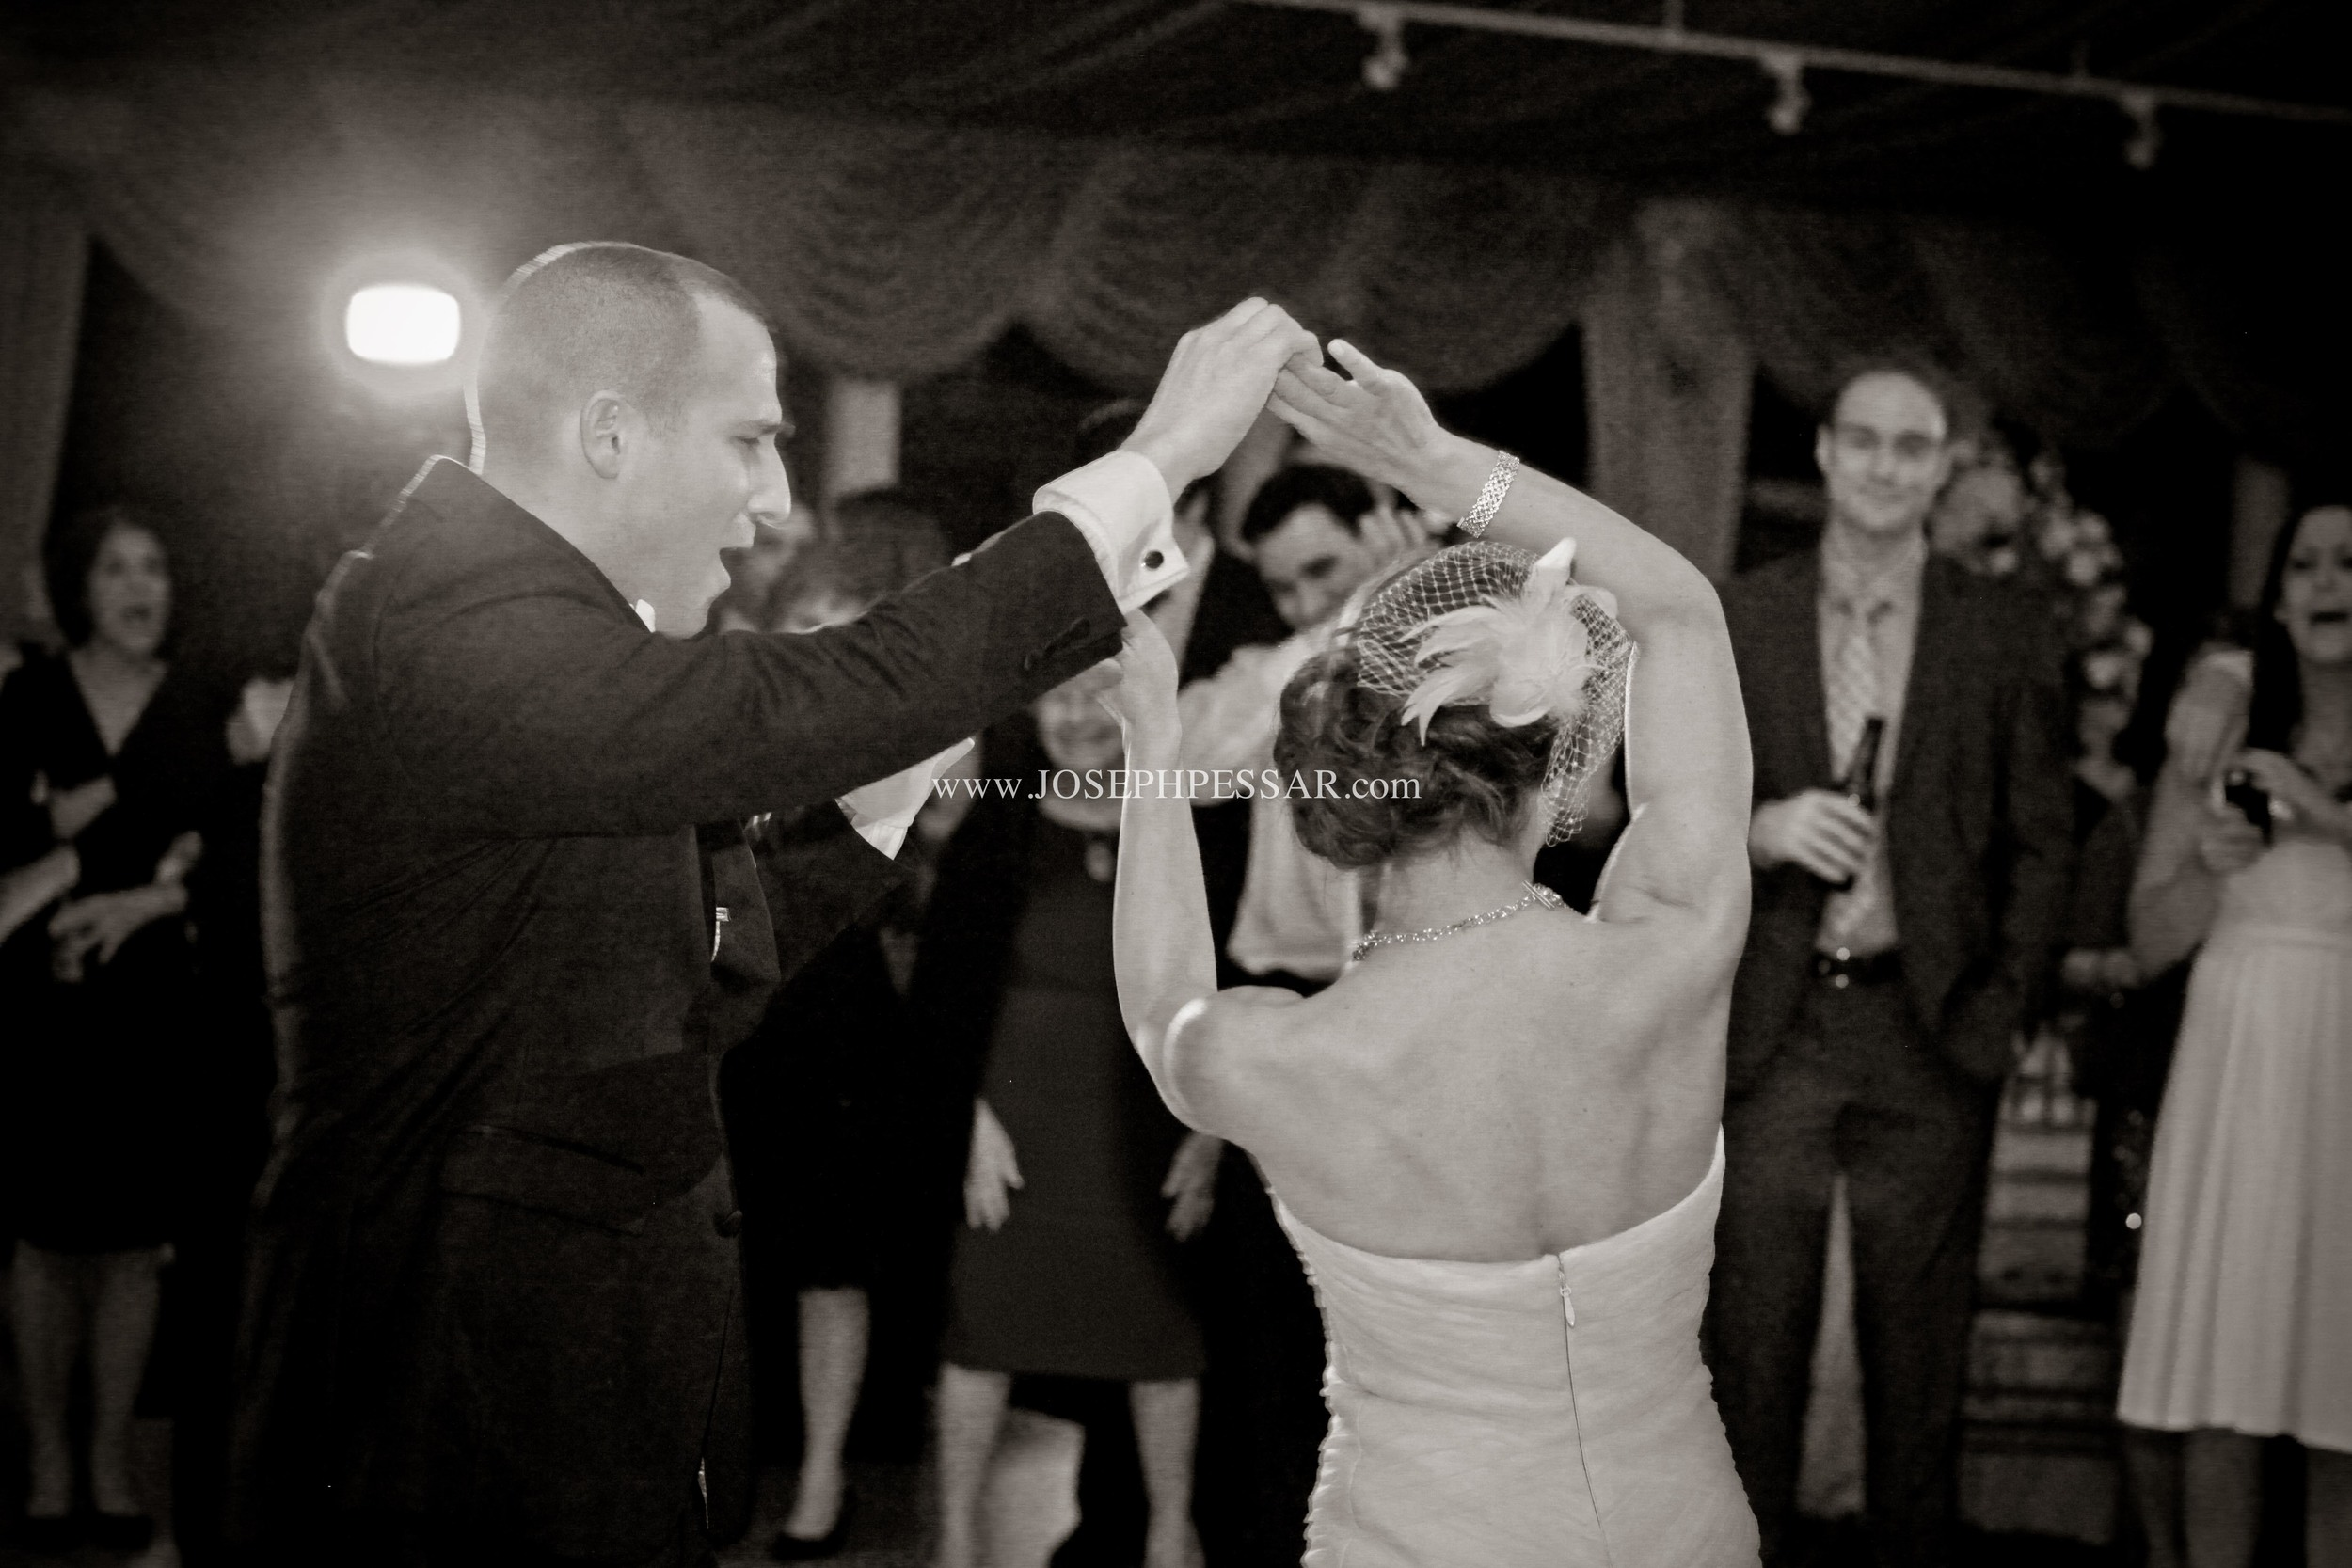 nyc_wedding_photographer0037.jpg